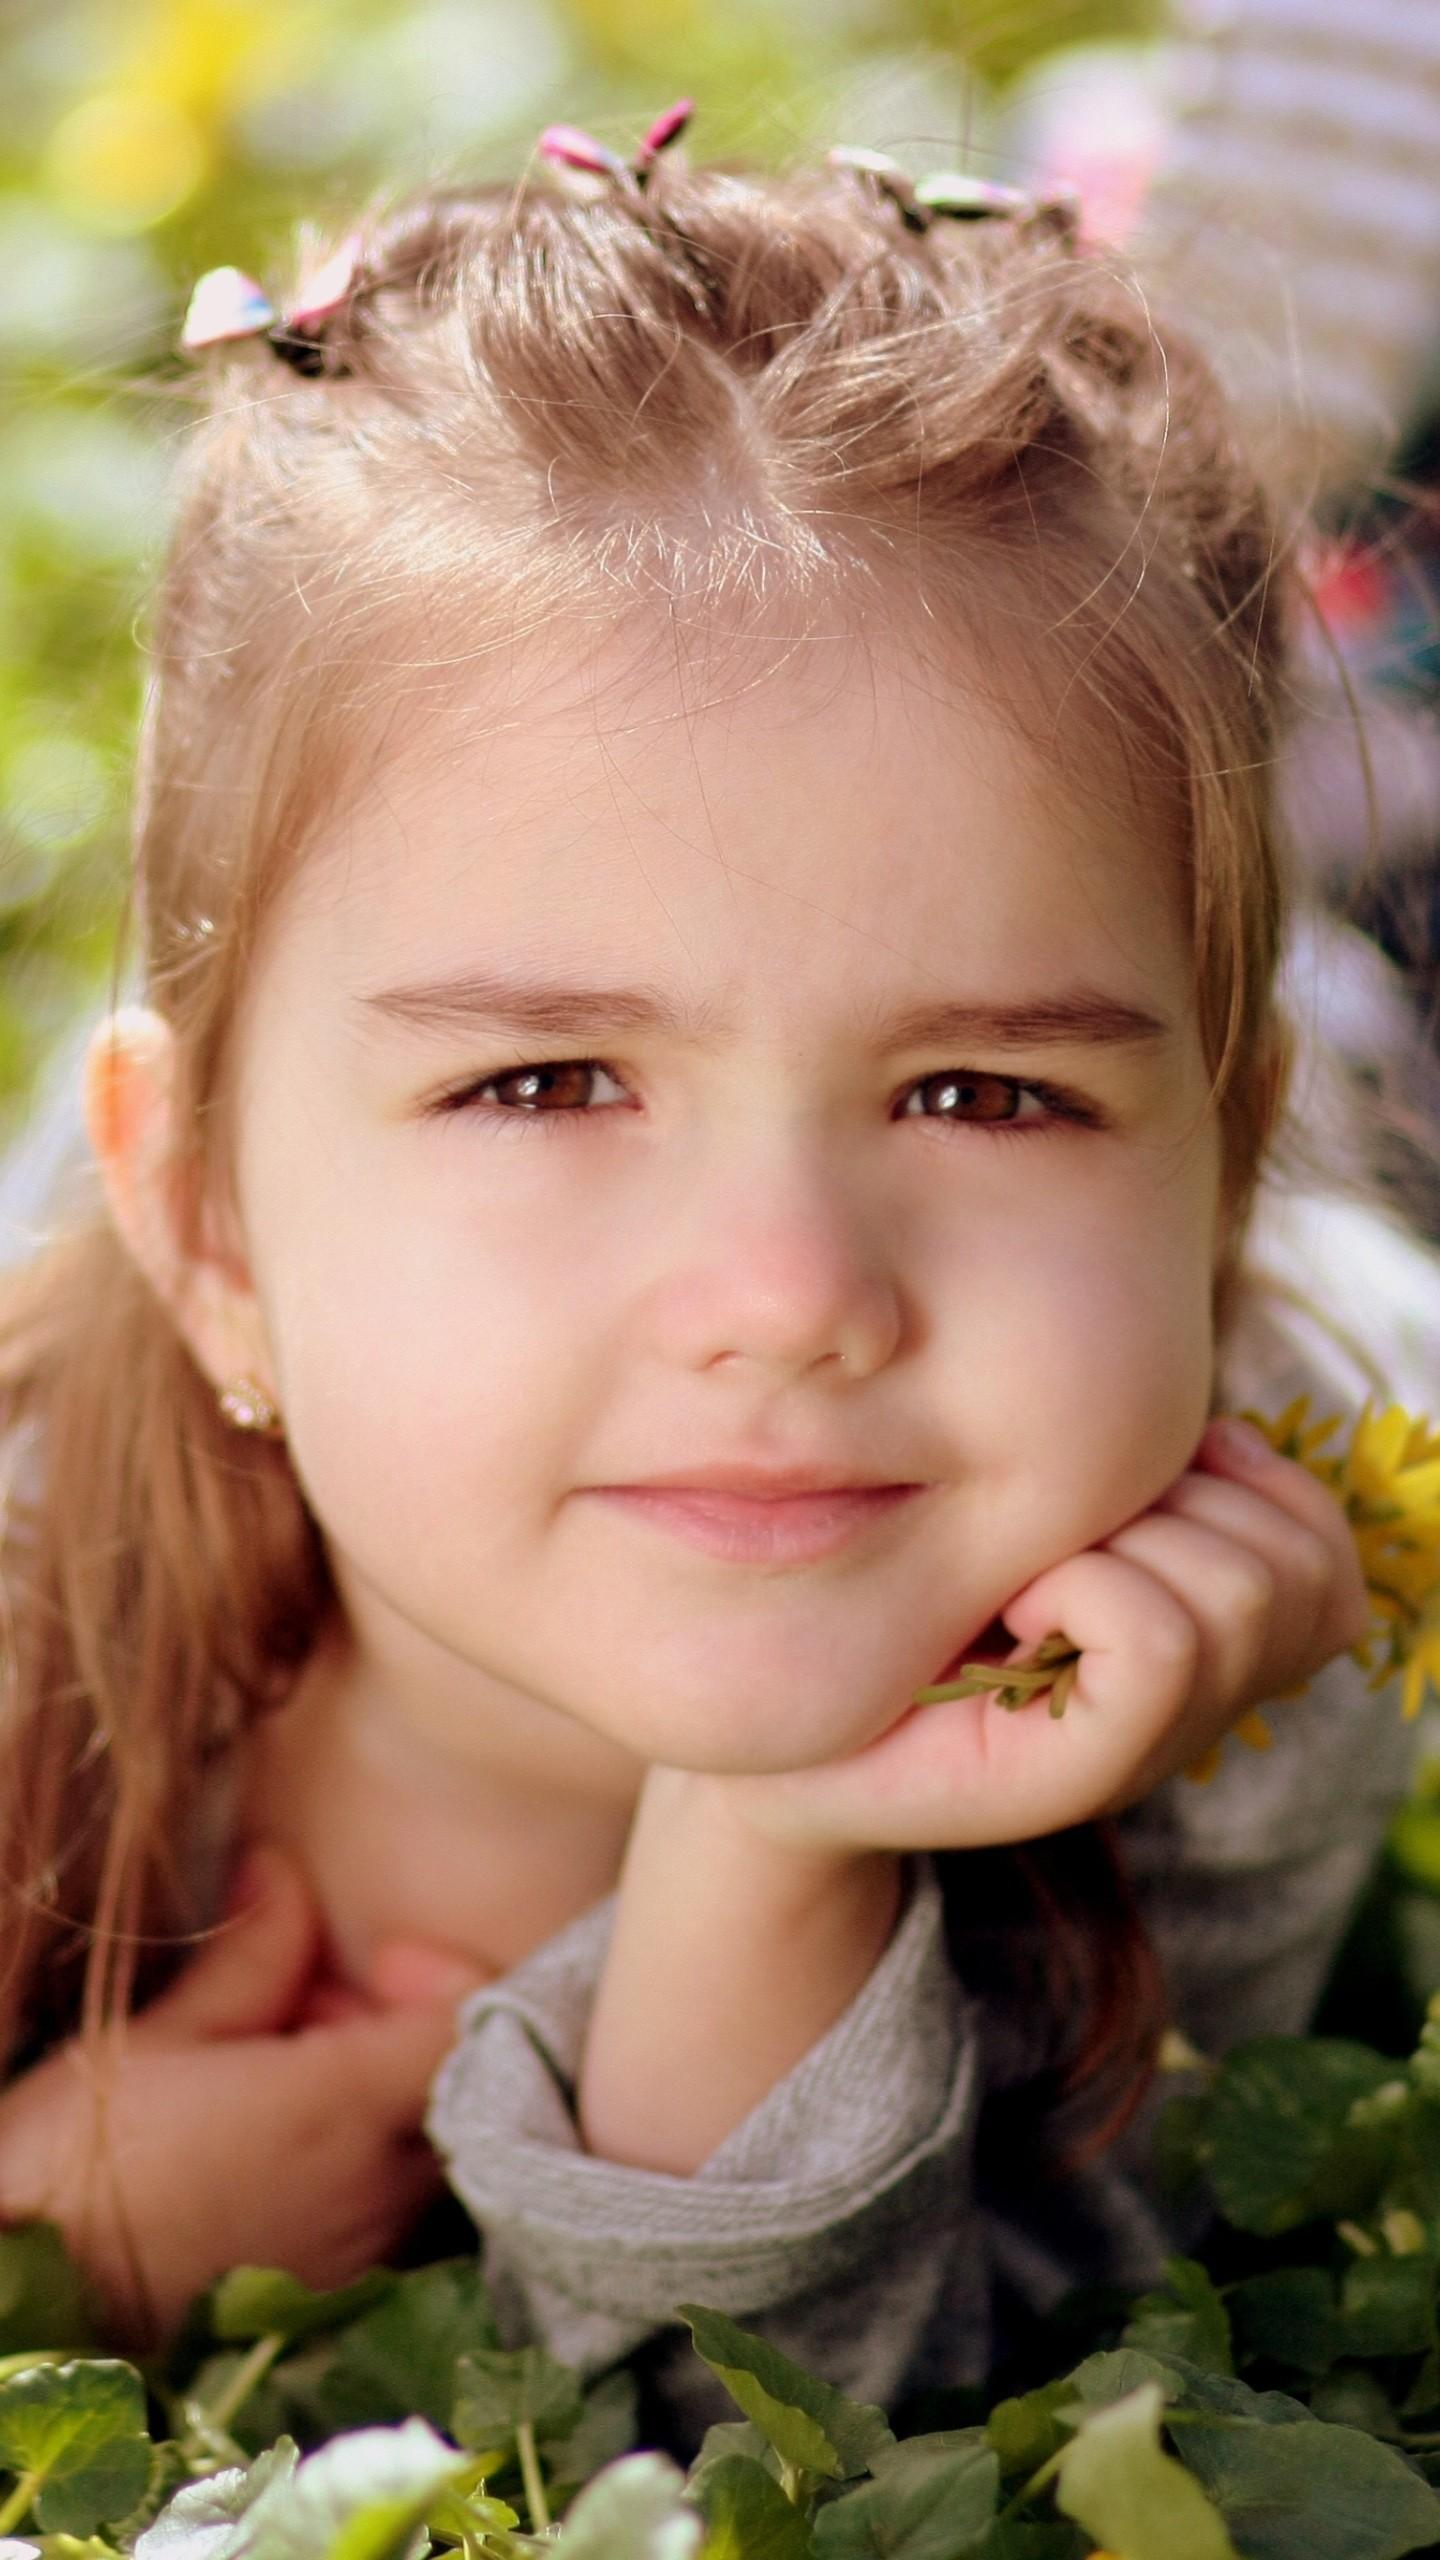 Cute Baby Girl Wallpaper Download Cute Baby Girl Wallpaper .